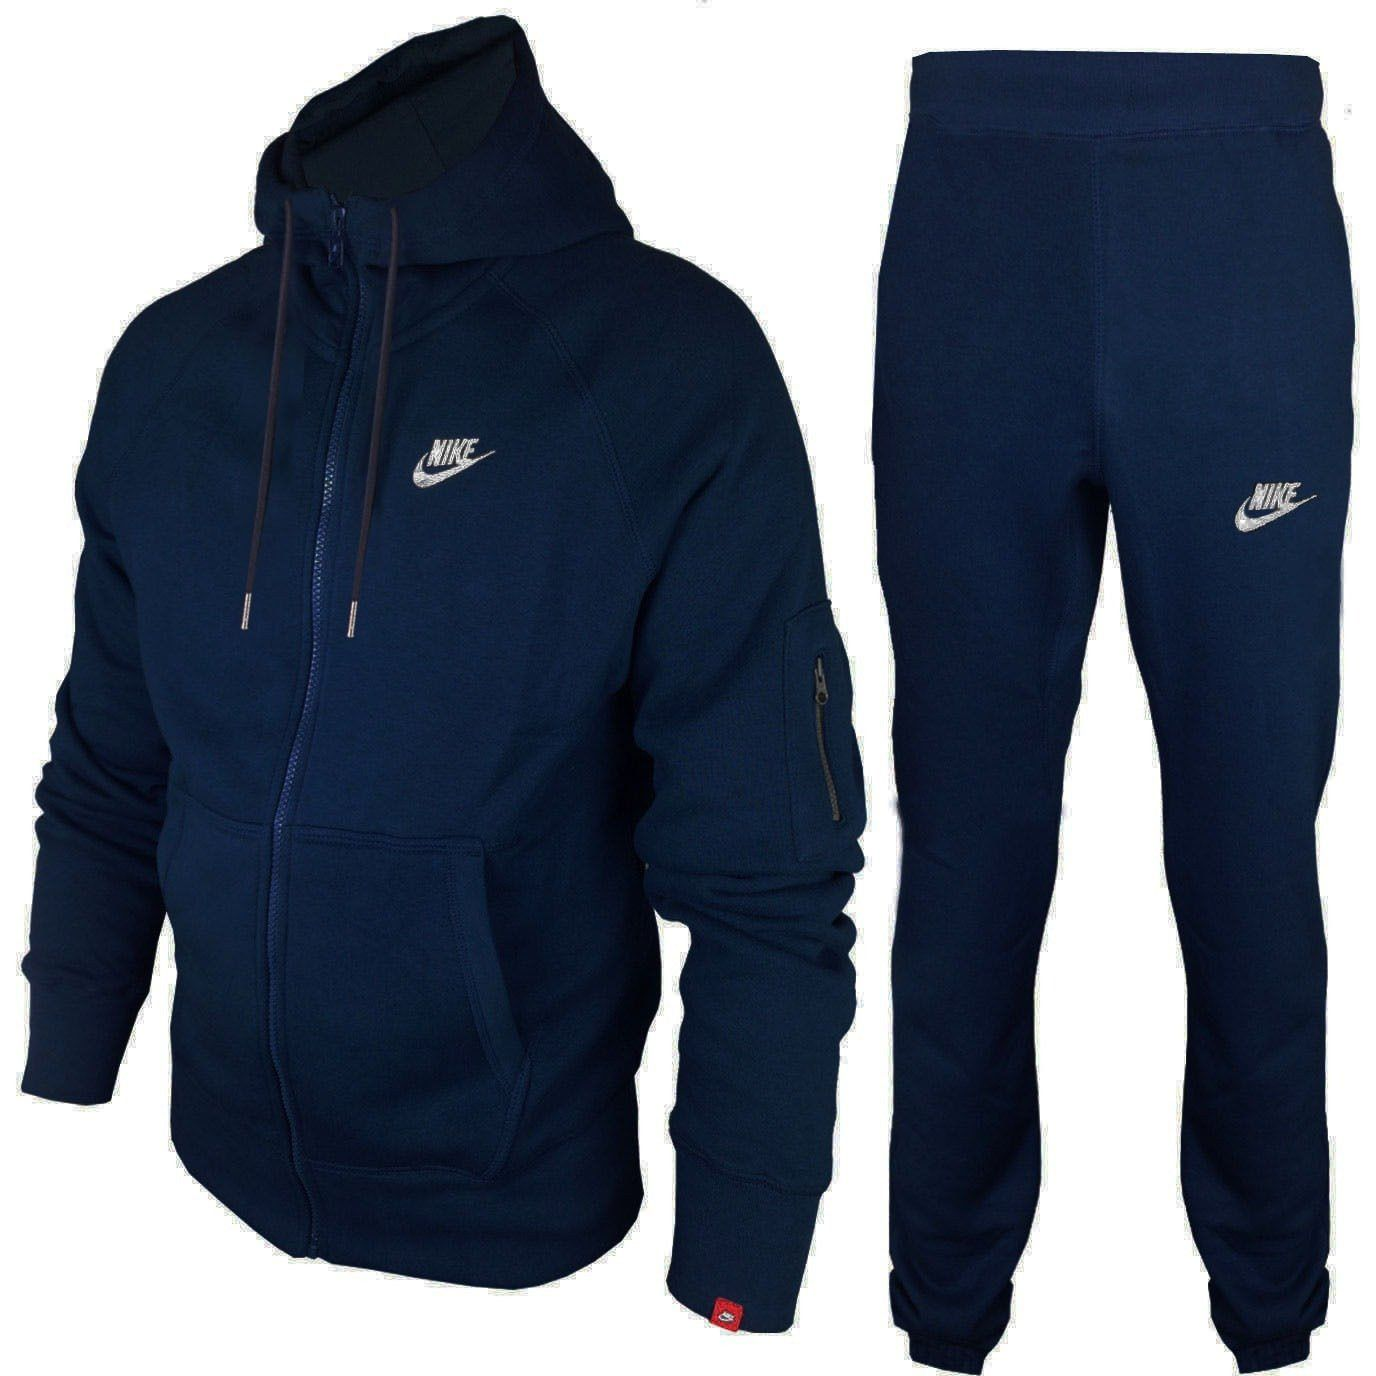 b34ca61eb265 Men Nike fleece navy tacksuit  photography  sale  niketshirts  calvinklein   skinny  nike  nikeairmax  causalwear  stoneisland  joggers